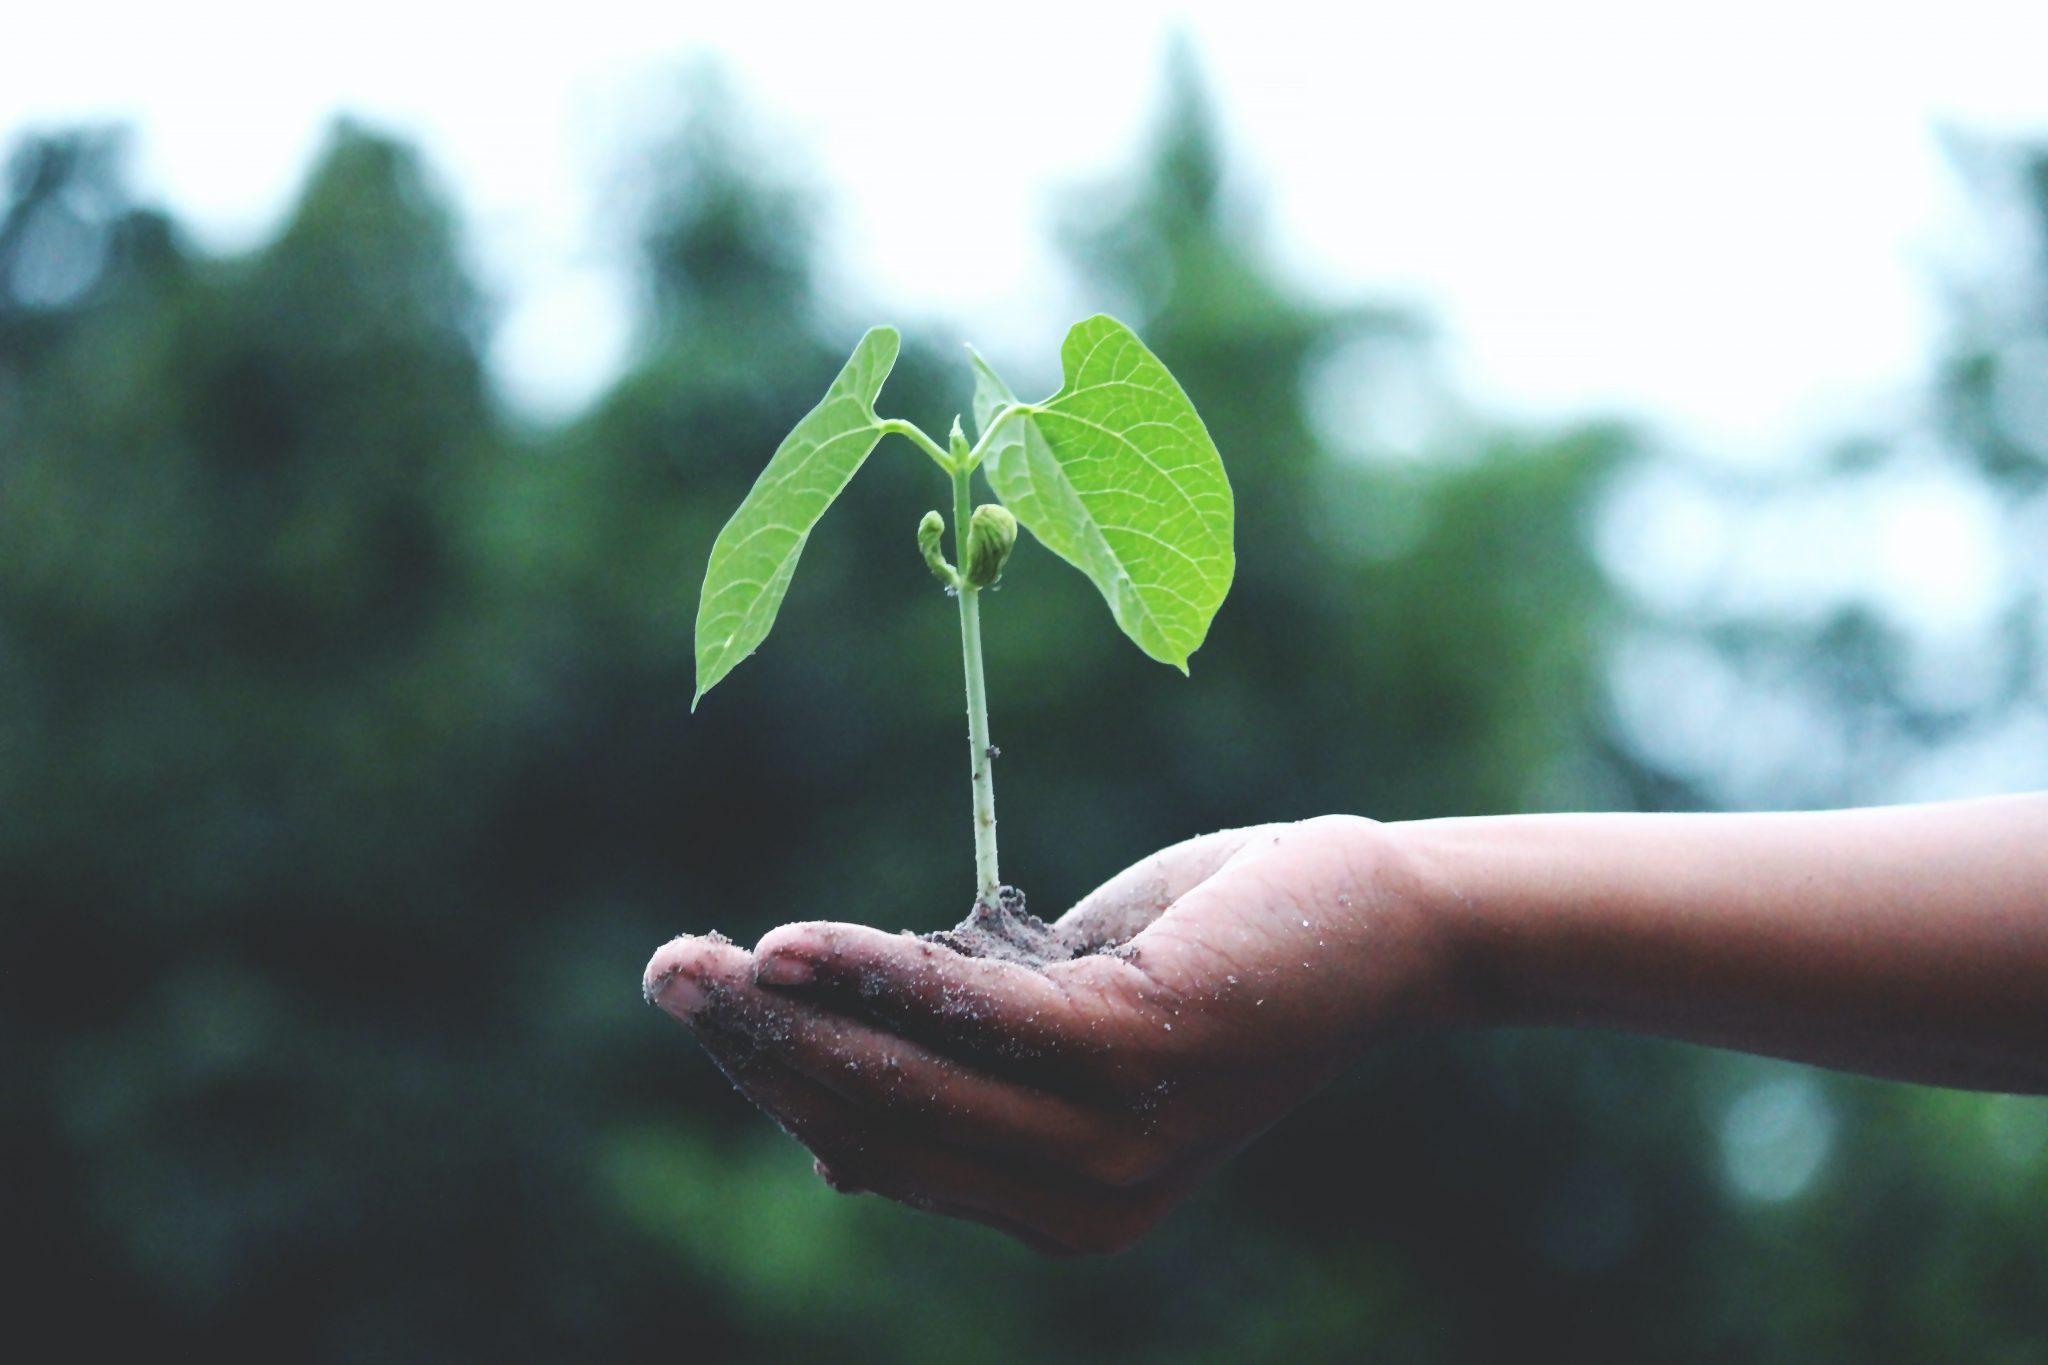 Una mano sostiene una planta. Foto: Akil Mazumder/Pexels